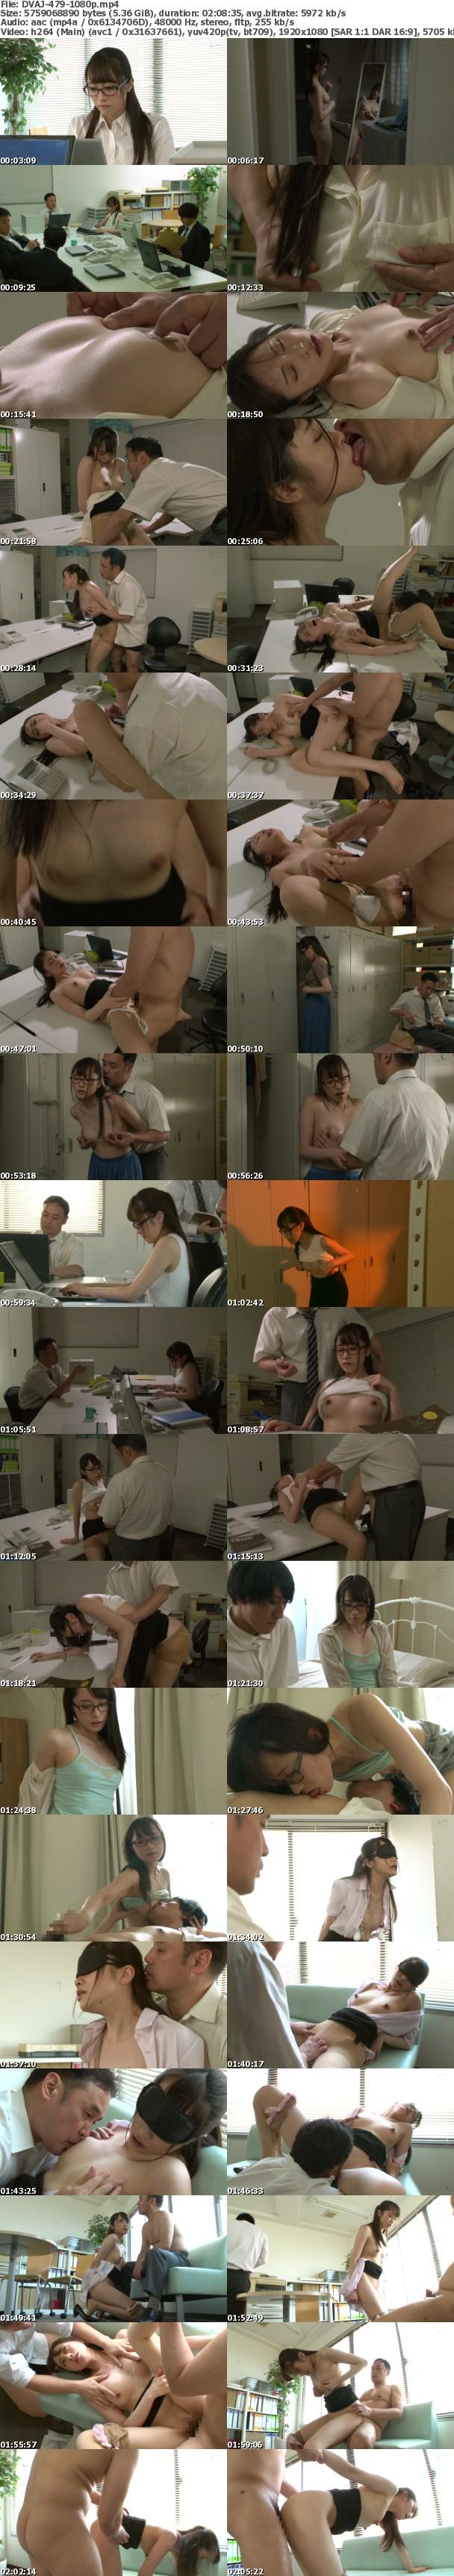 (Full HD) DVAJ-479 上司に乳首ハラスメントされ続け、早漏イクイク敏感体質に仕込まれた女子社員 桐山結羽